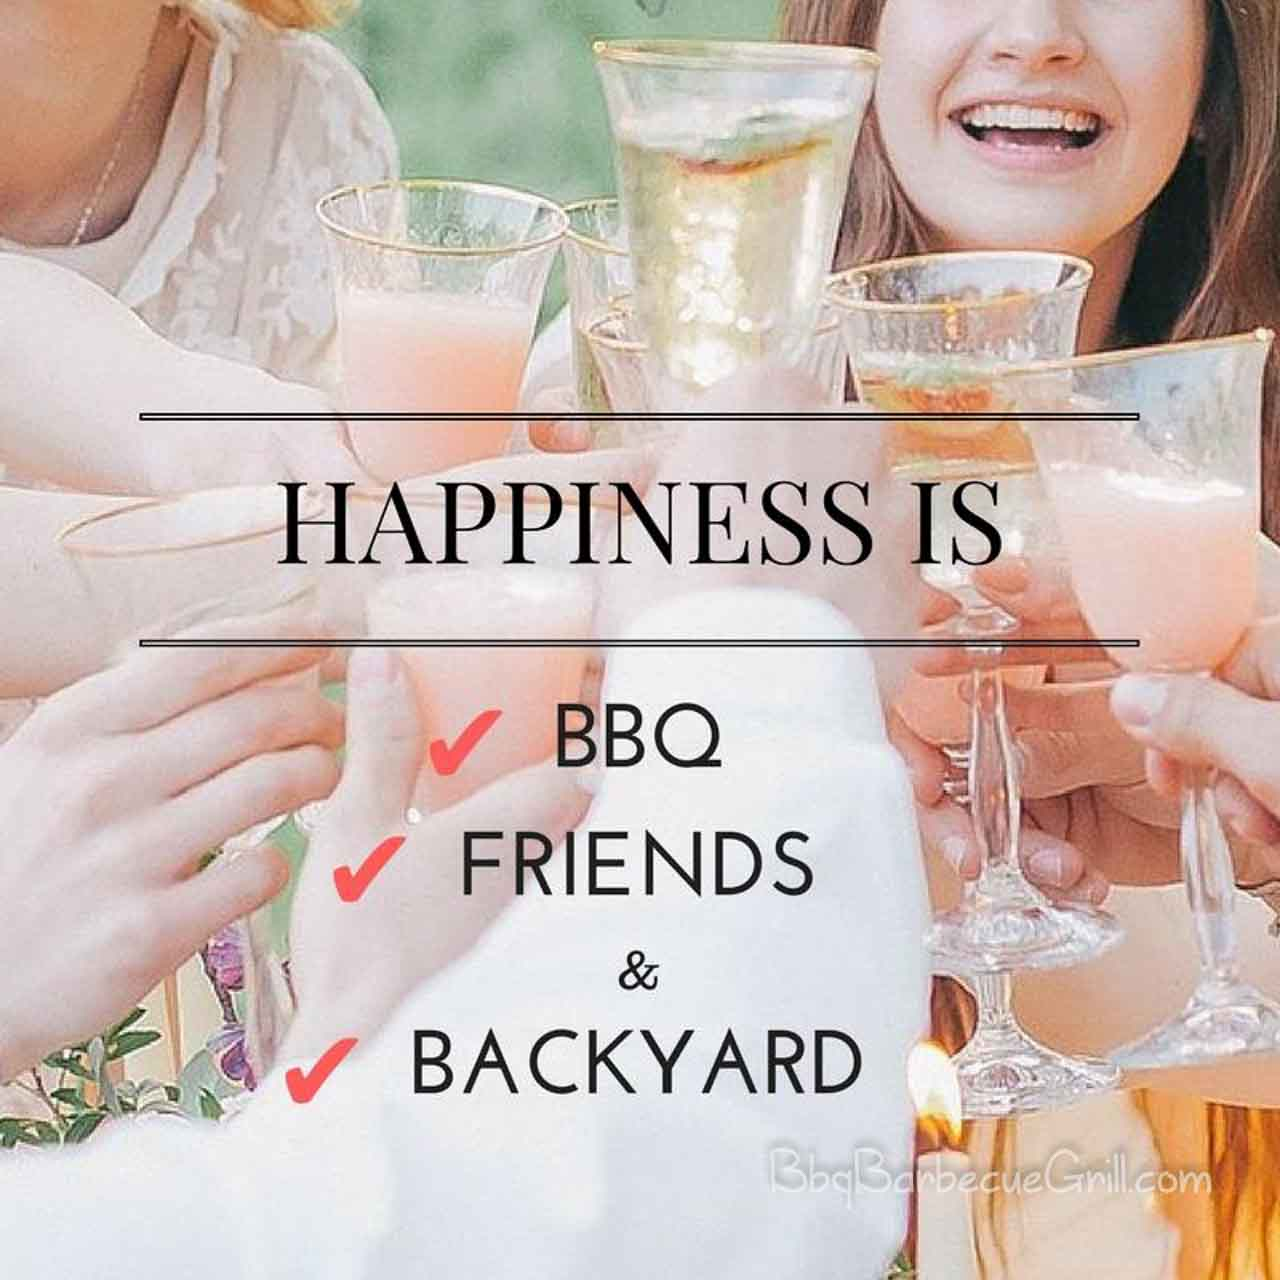 Happiness is BBQ, friends & backyard.